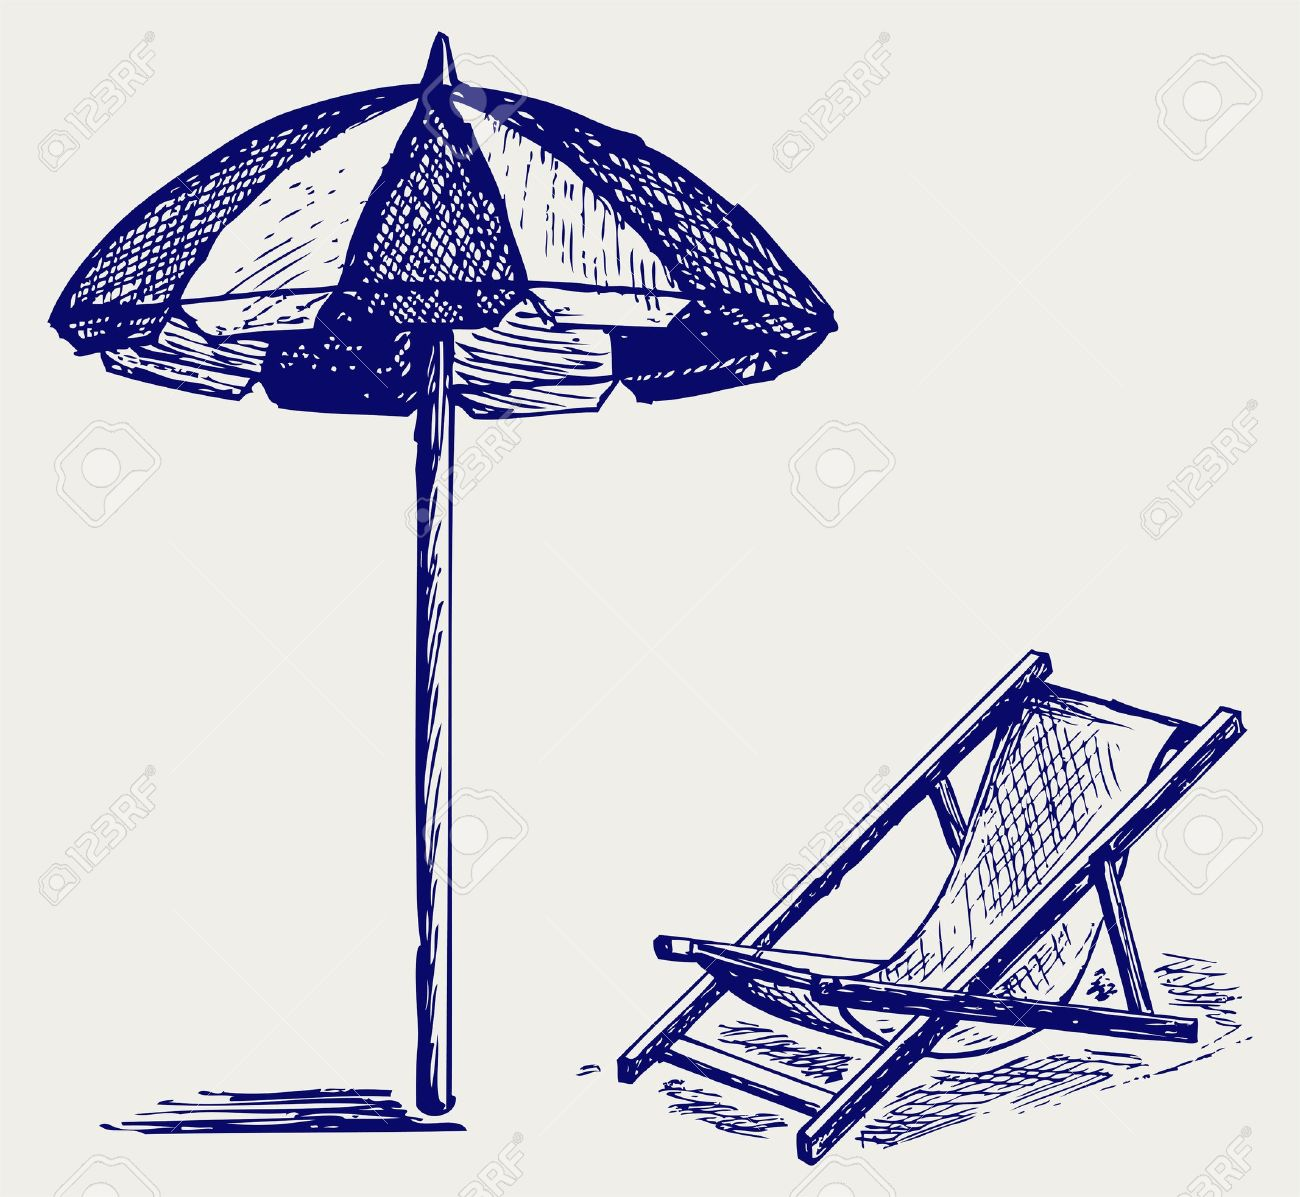 Beach chair drawing - Folding Beach Chair Chair And Beach Umbrella Doodle Style